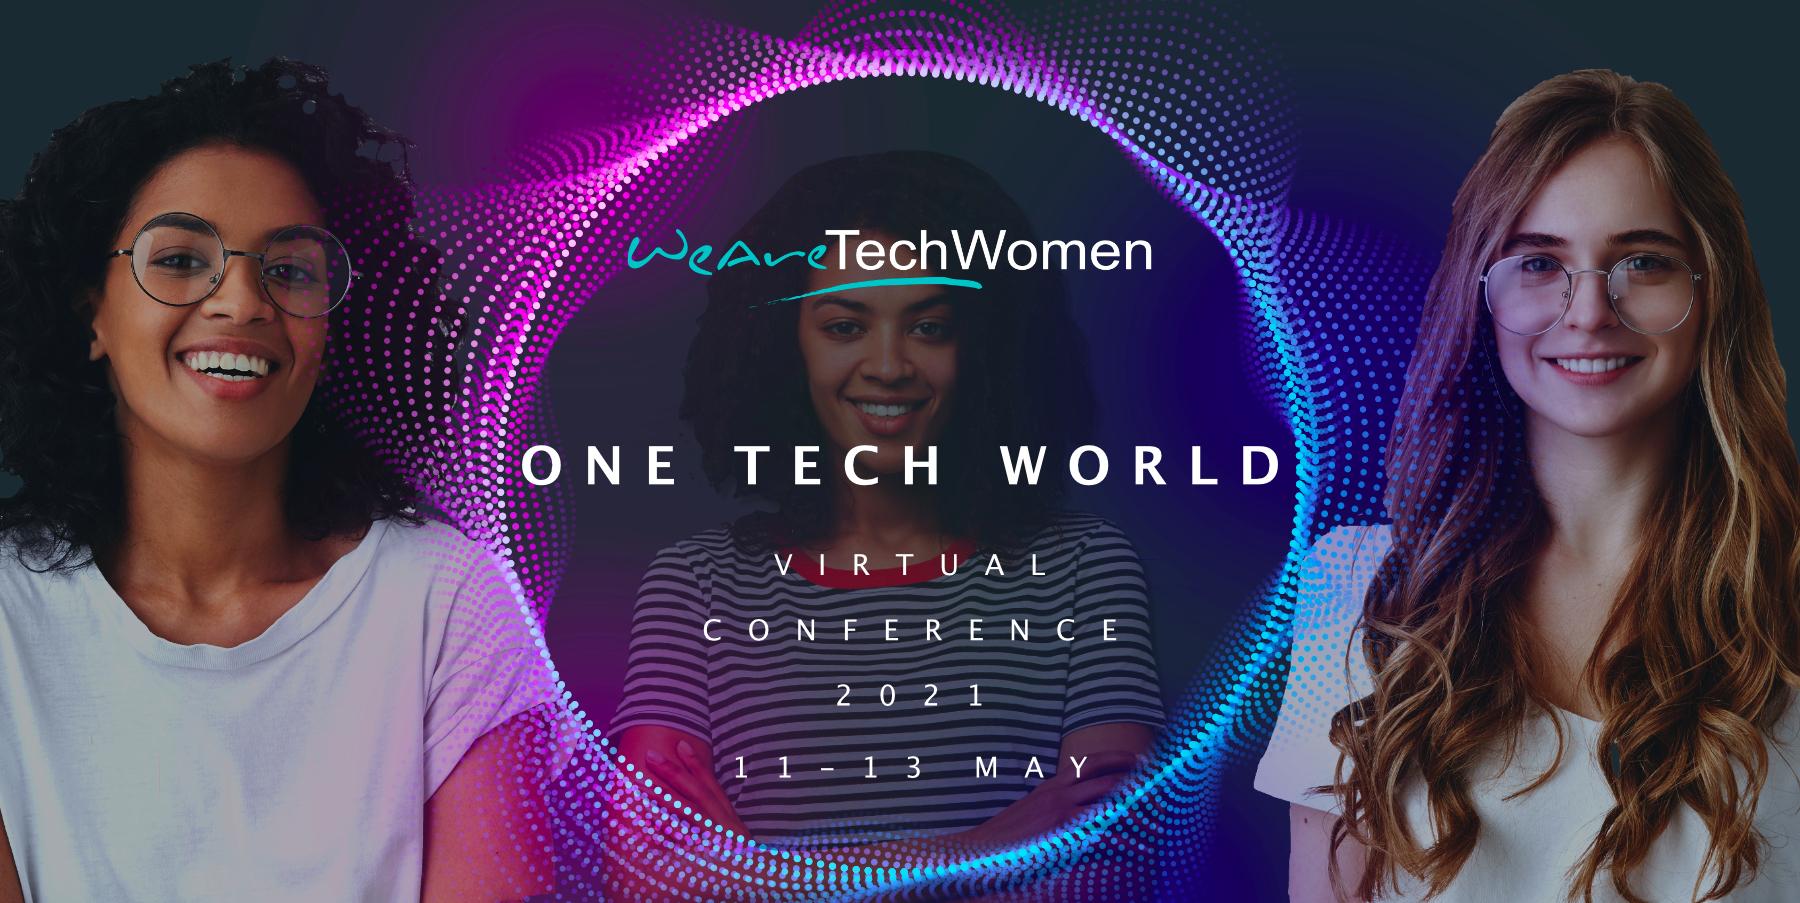 One Tech World - WeAreTechWomen Conference 2021 - Main Images 3